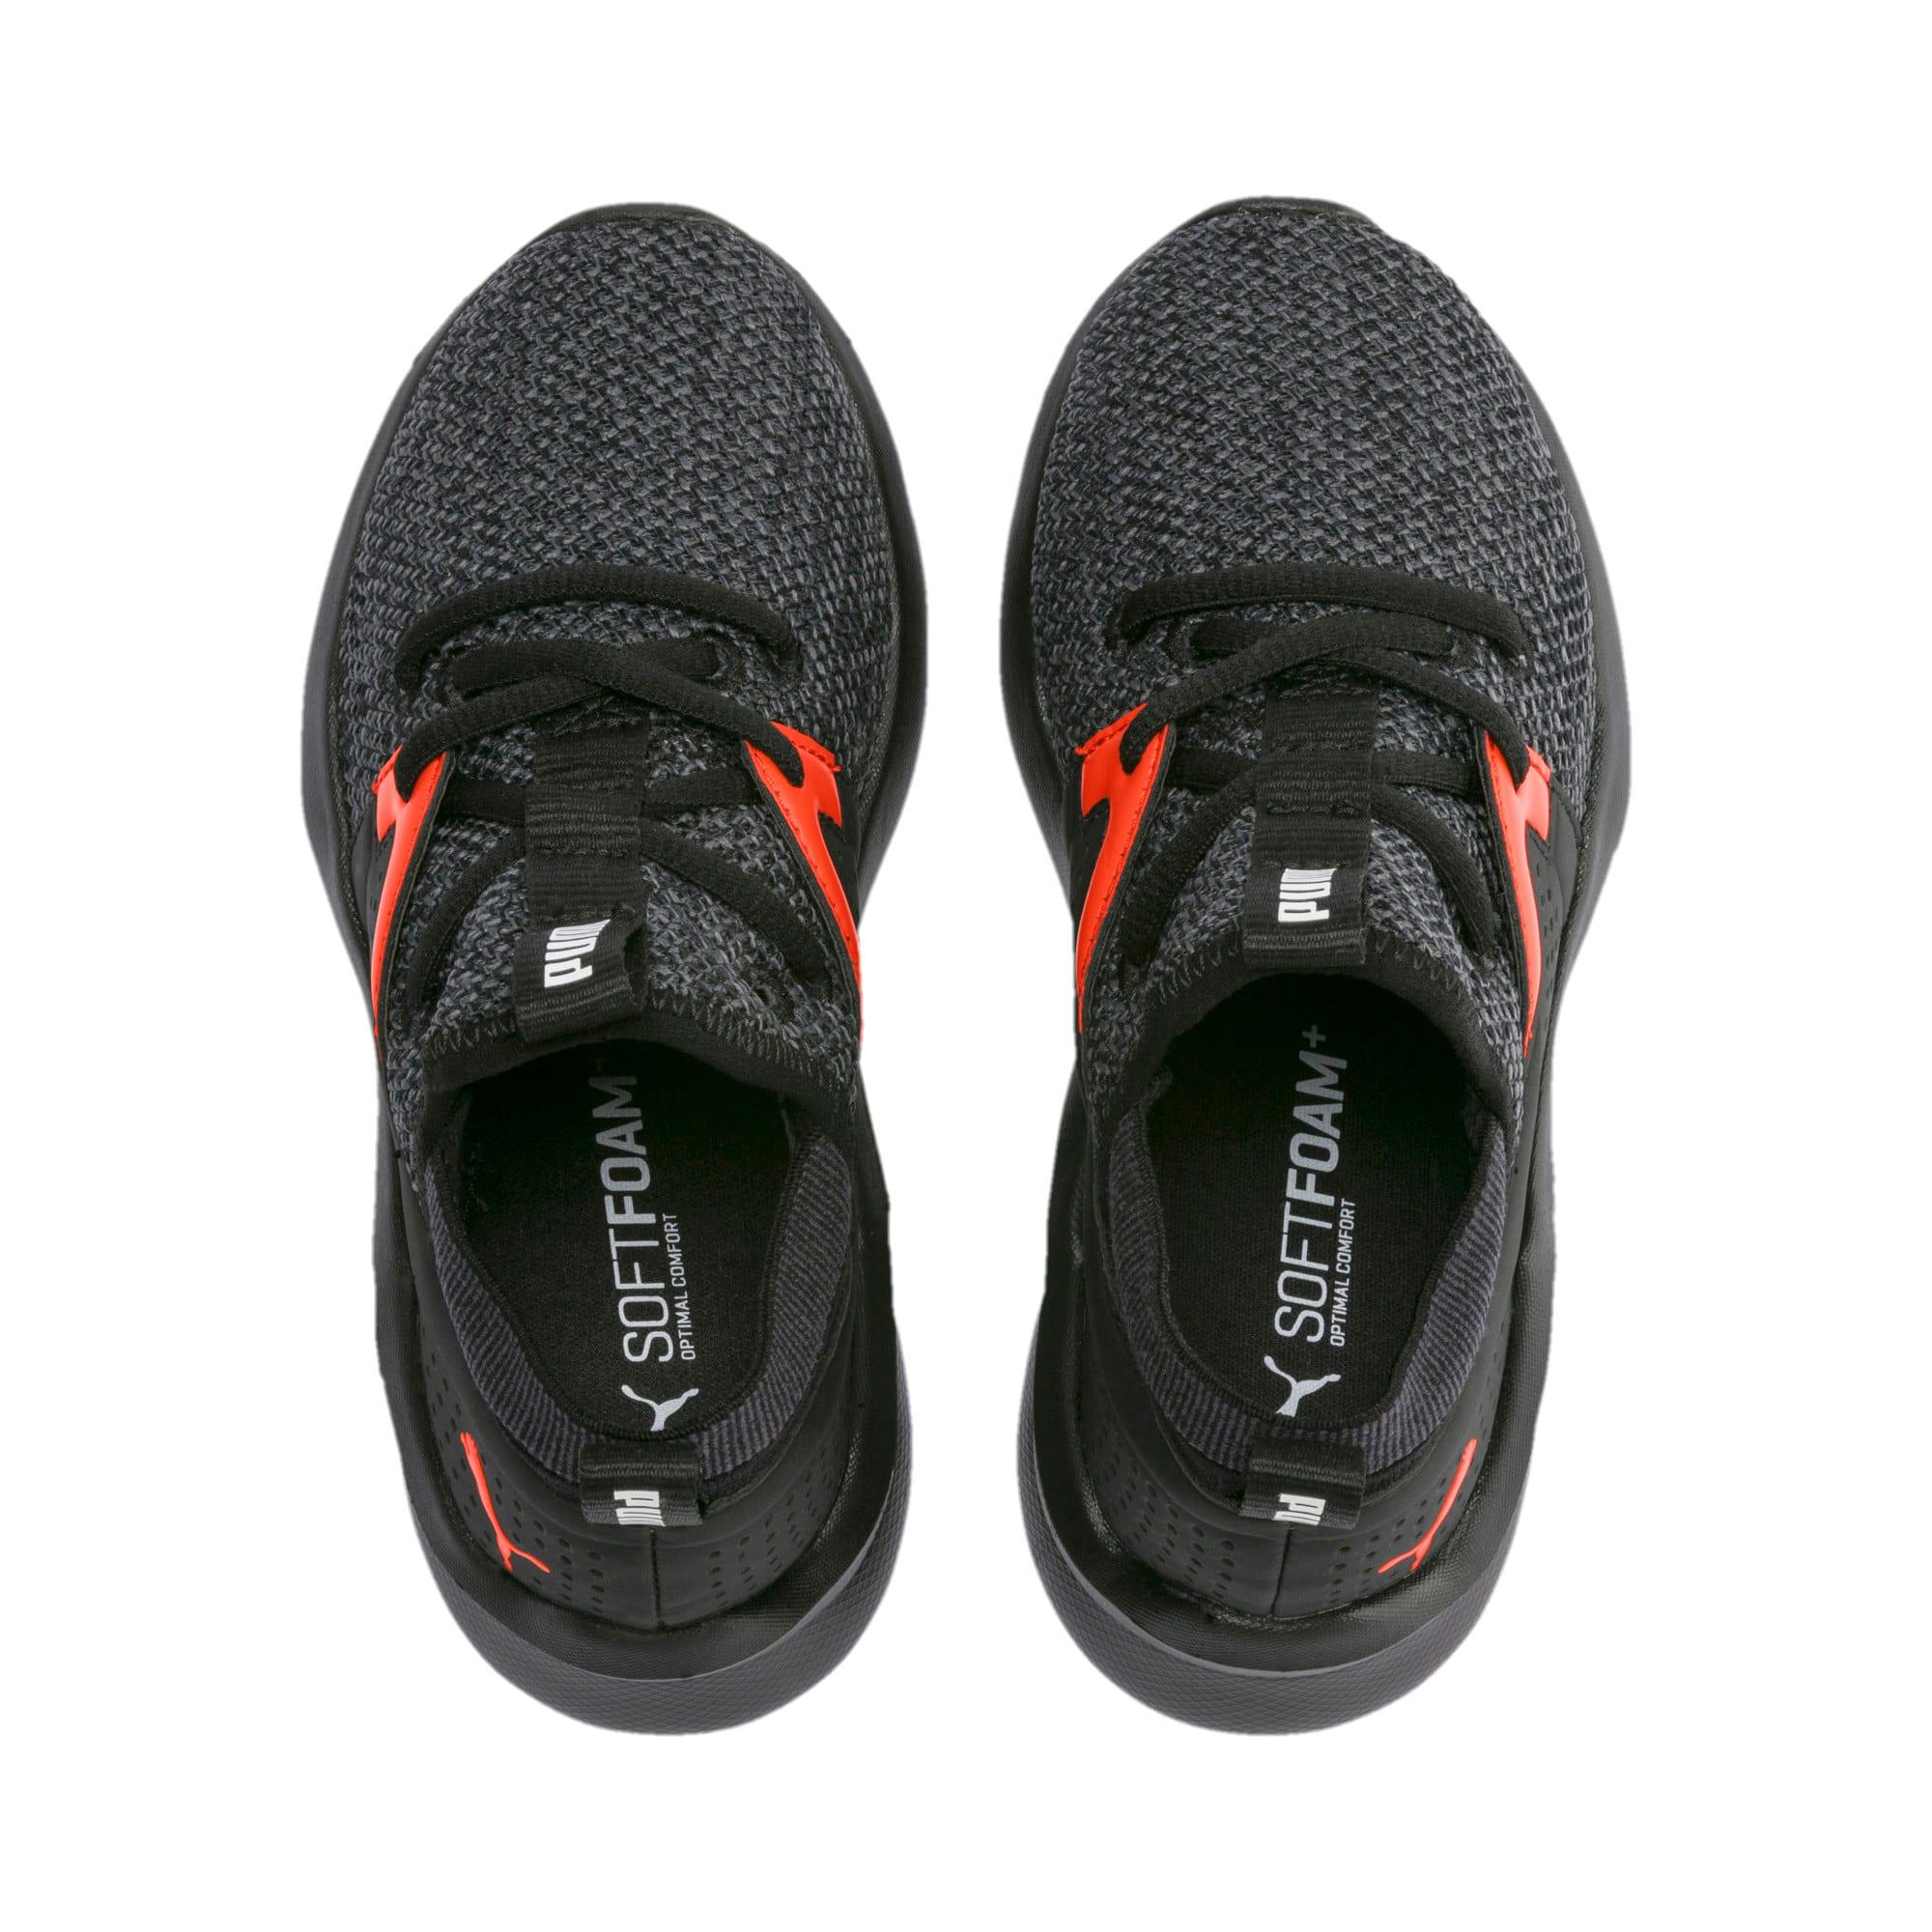 Thumbnail 6 of Emergence Little Kids' Shoes, Puma Black-Cherry Tomato, medium